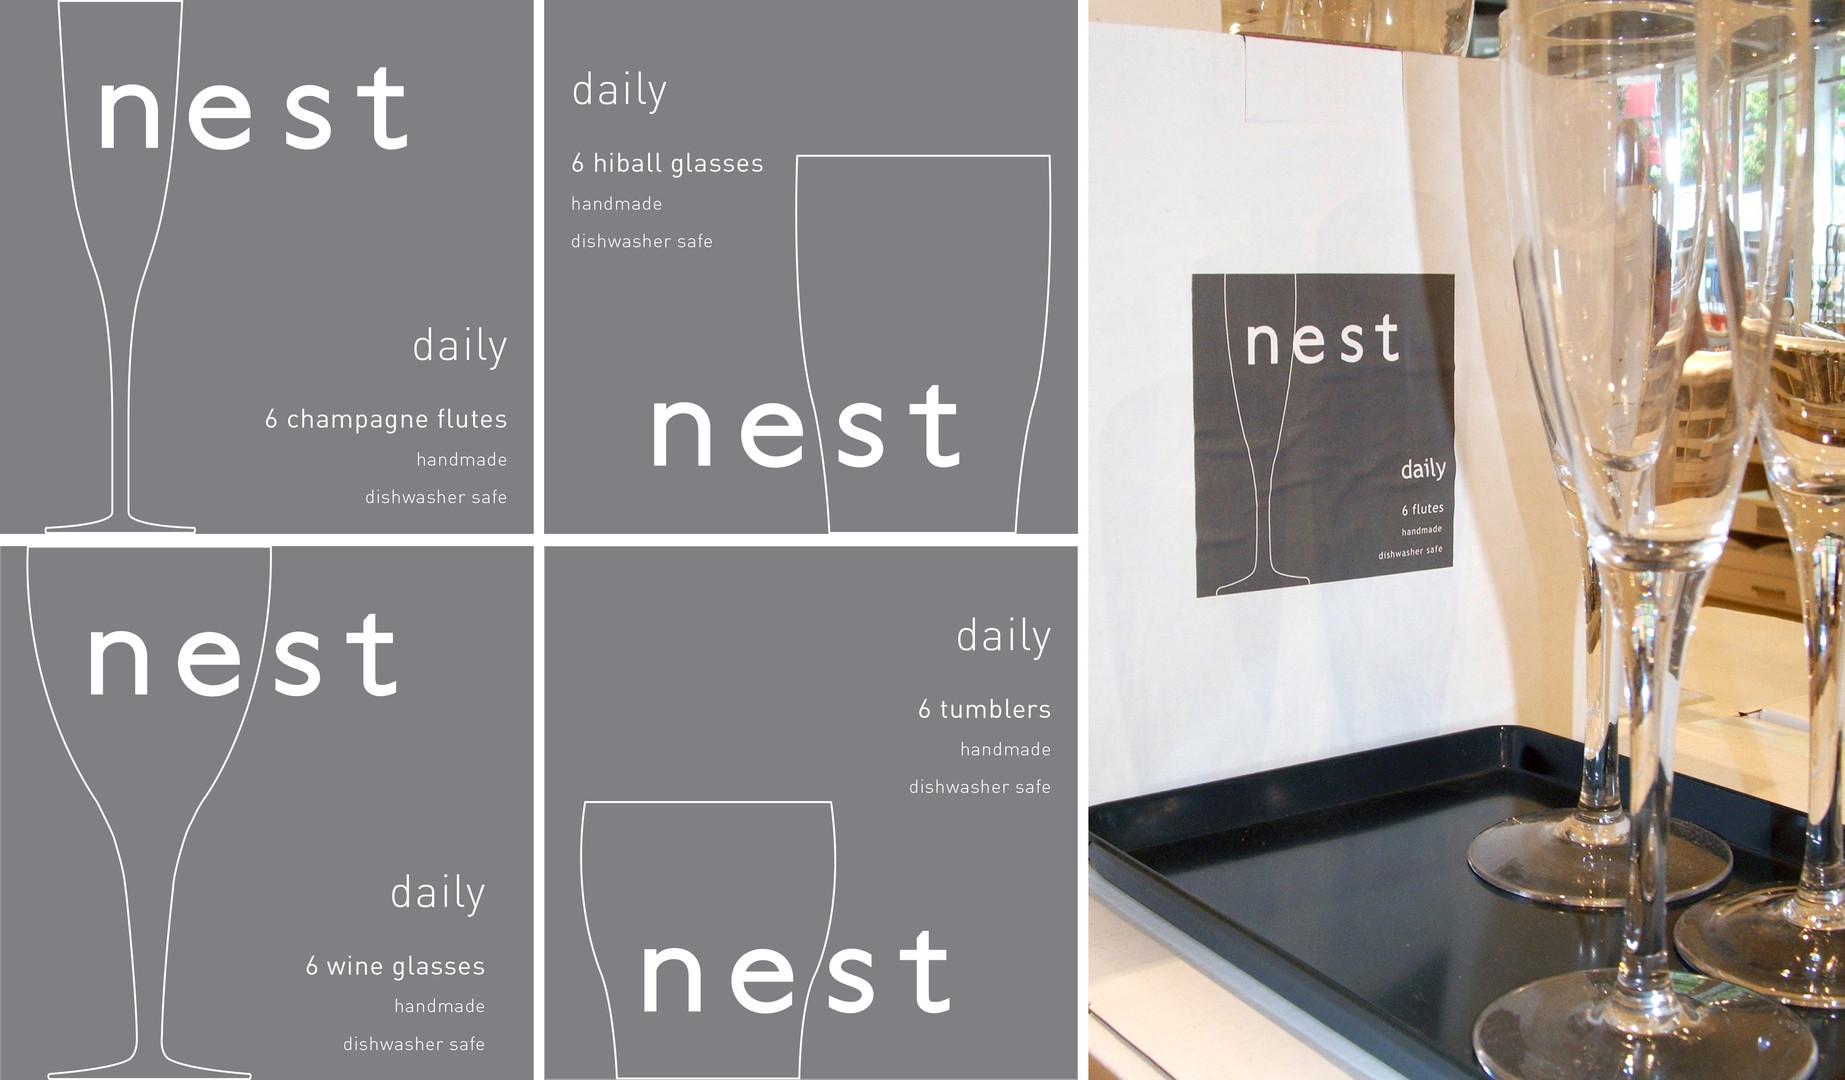 New packaging created for Nest glasseware range.